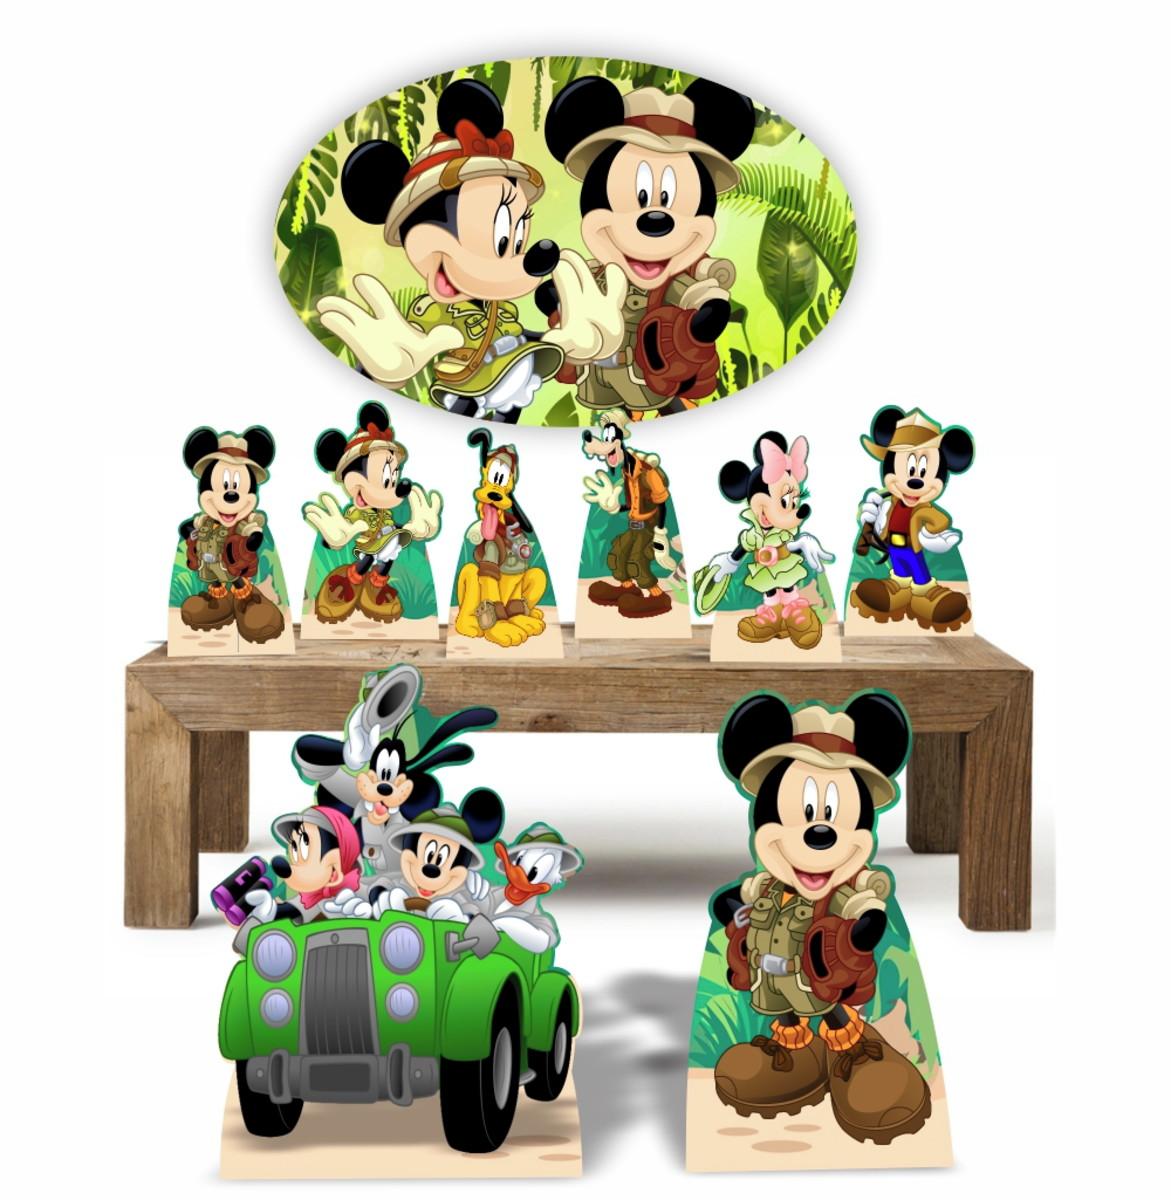 Mickey Safari Kit com 8 Displays + Placa Elipse 67 cm no Elo7 ... 3059b765a17b4